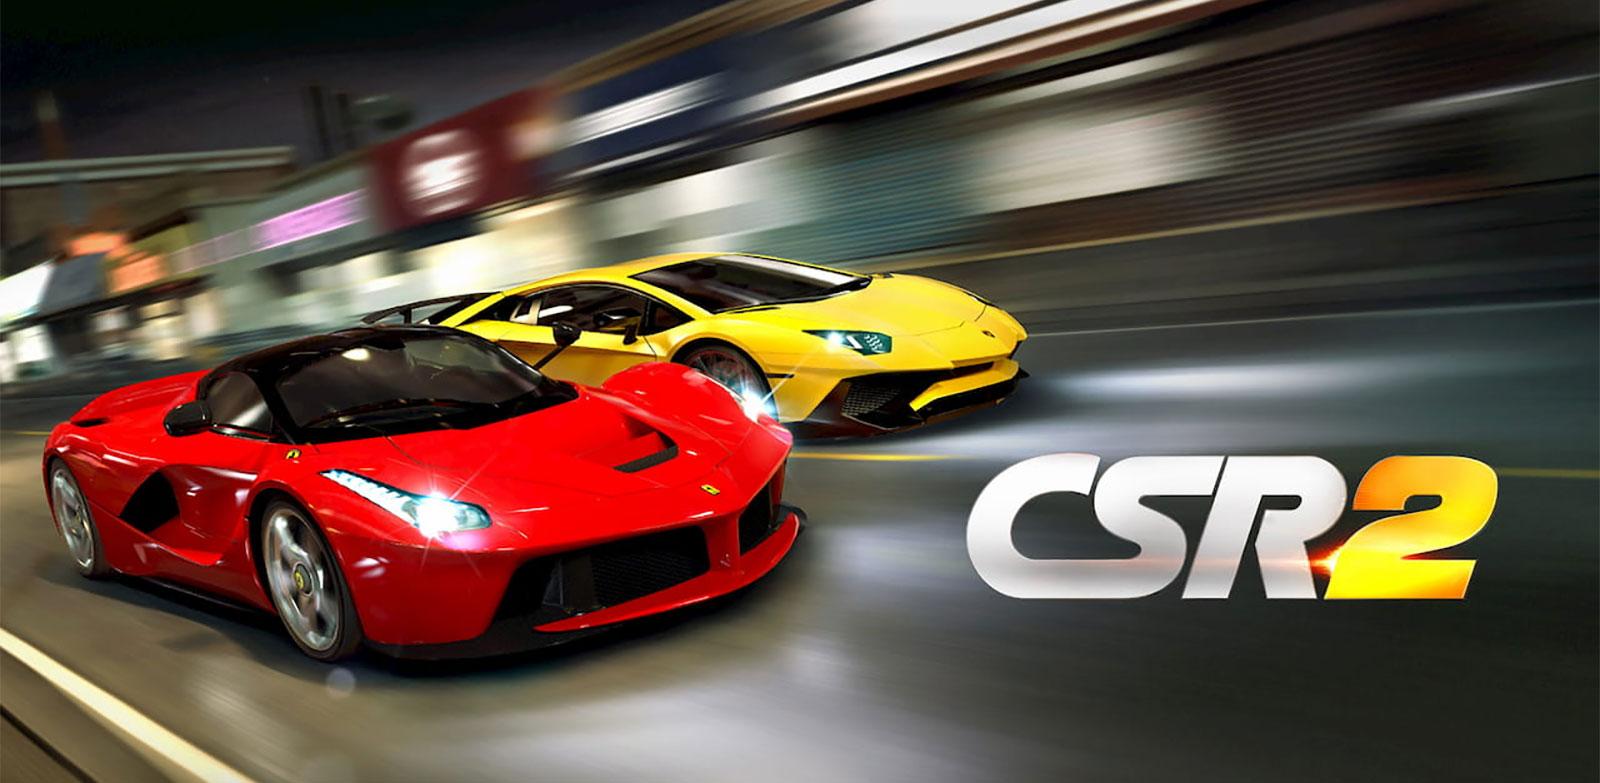 Download CSR Racing 2 Apk 2.11.0 (Original) For Android